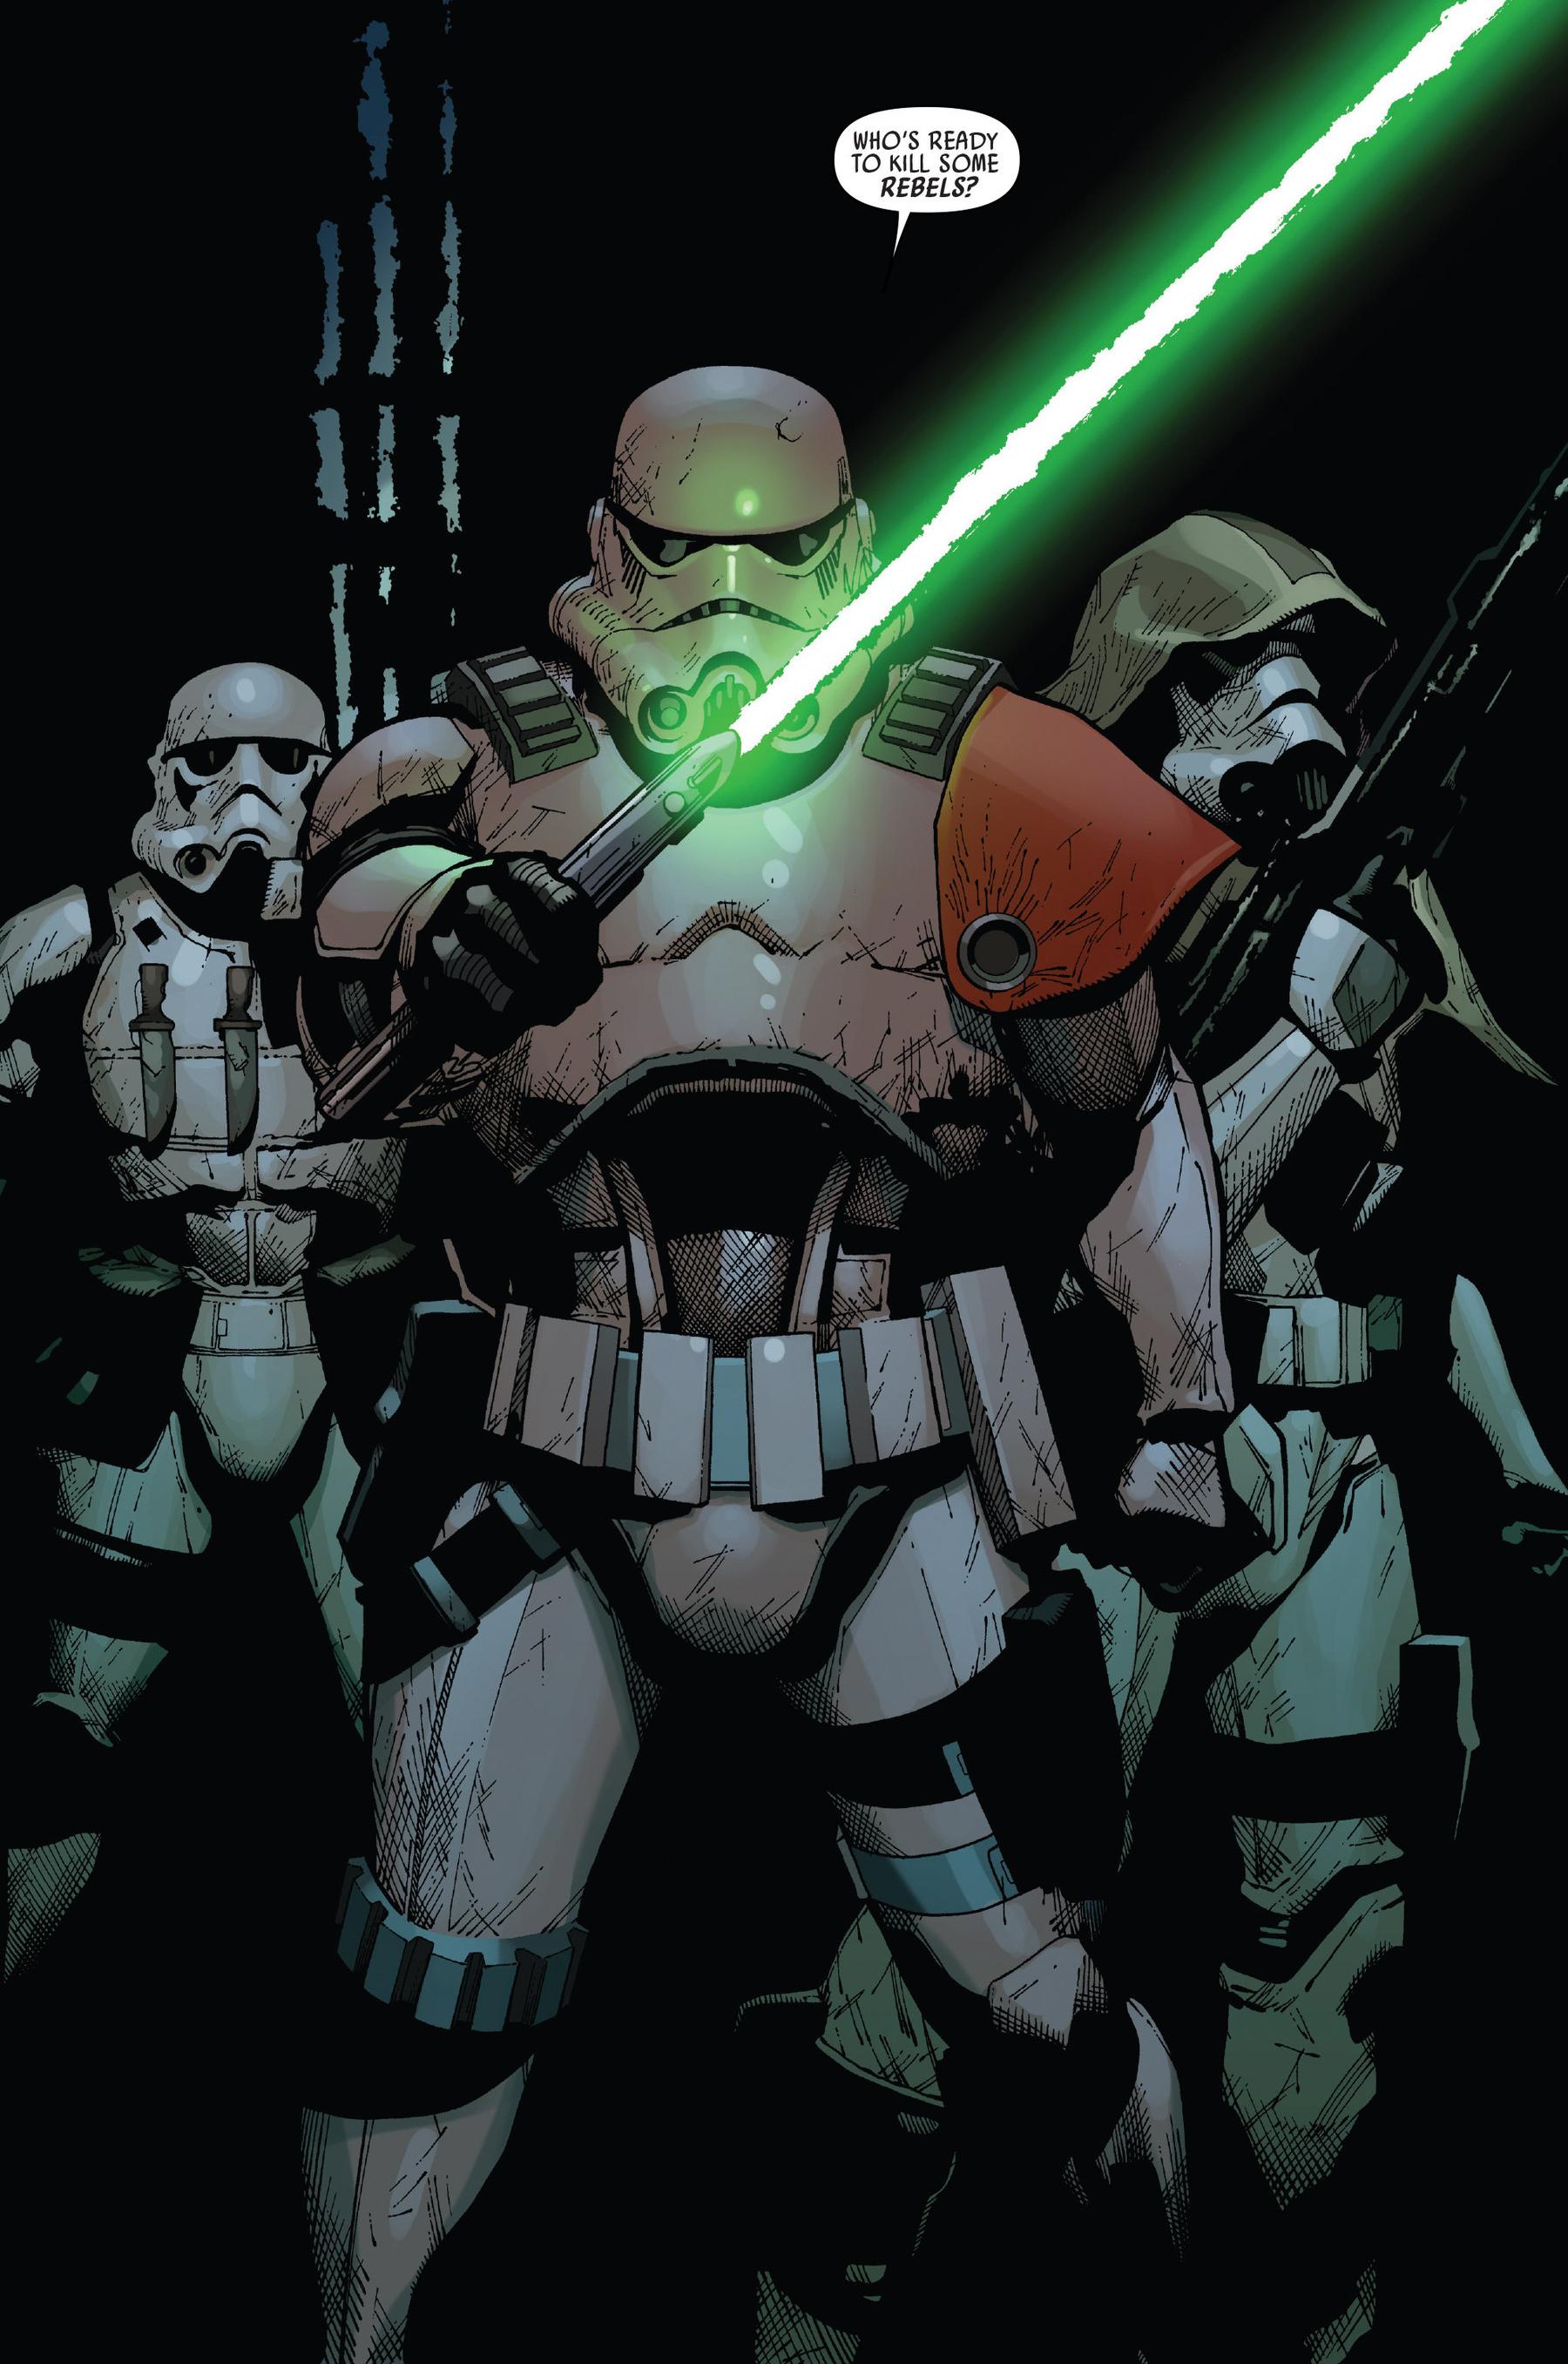 Sergeant Kreel Leads The Elite Stormtrooper Group Known As Task Force 99 Star Wars Comics Star Wars Characters Star Wars Artwork